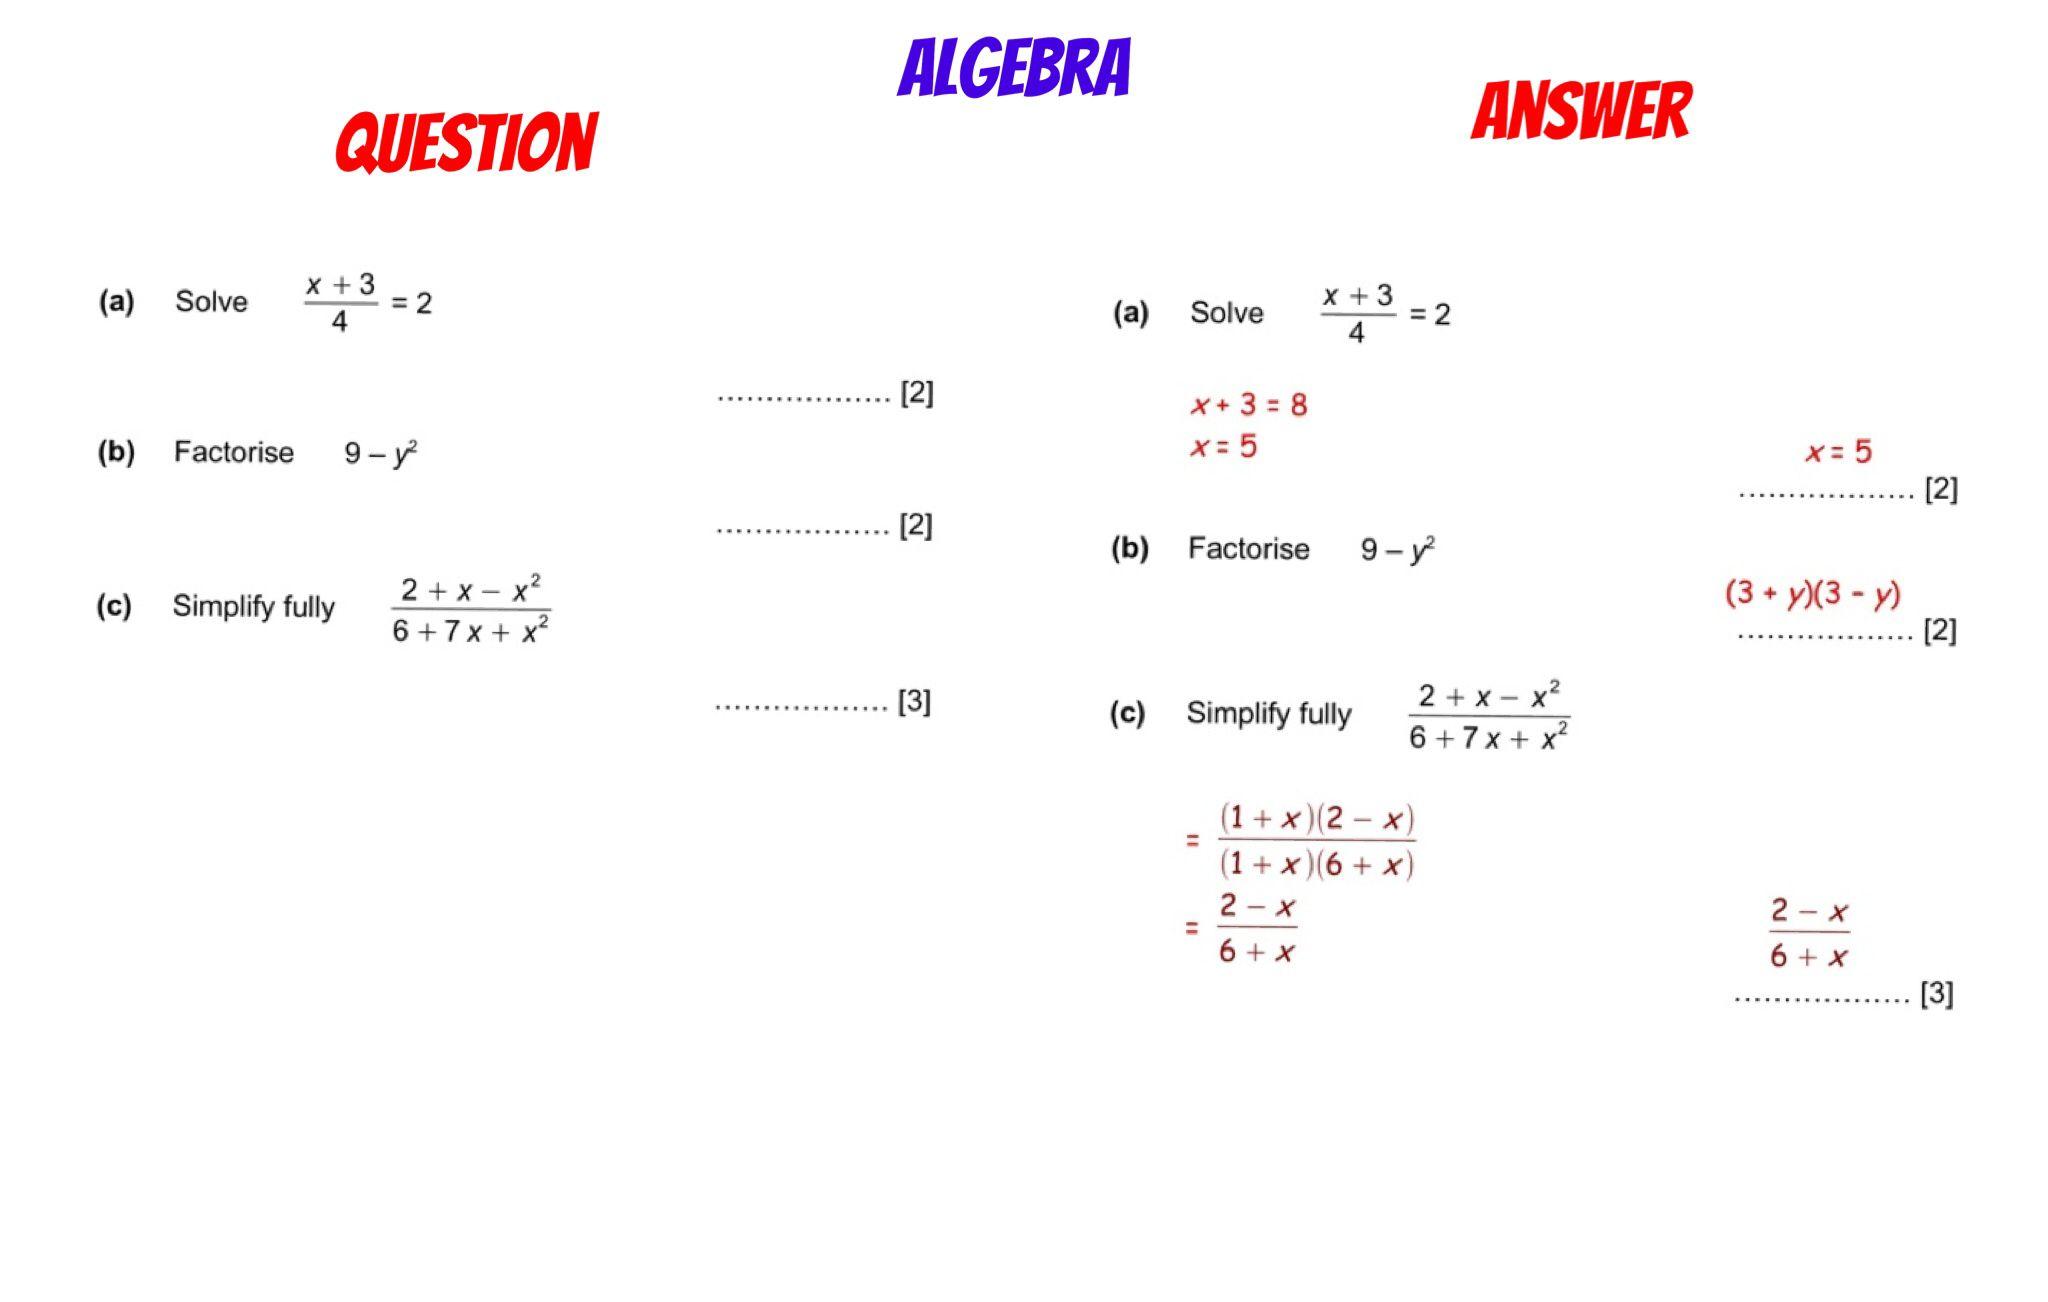 Gcse Revision: Solving, Simplifying Algebraic Fractions, Factorising